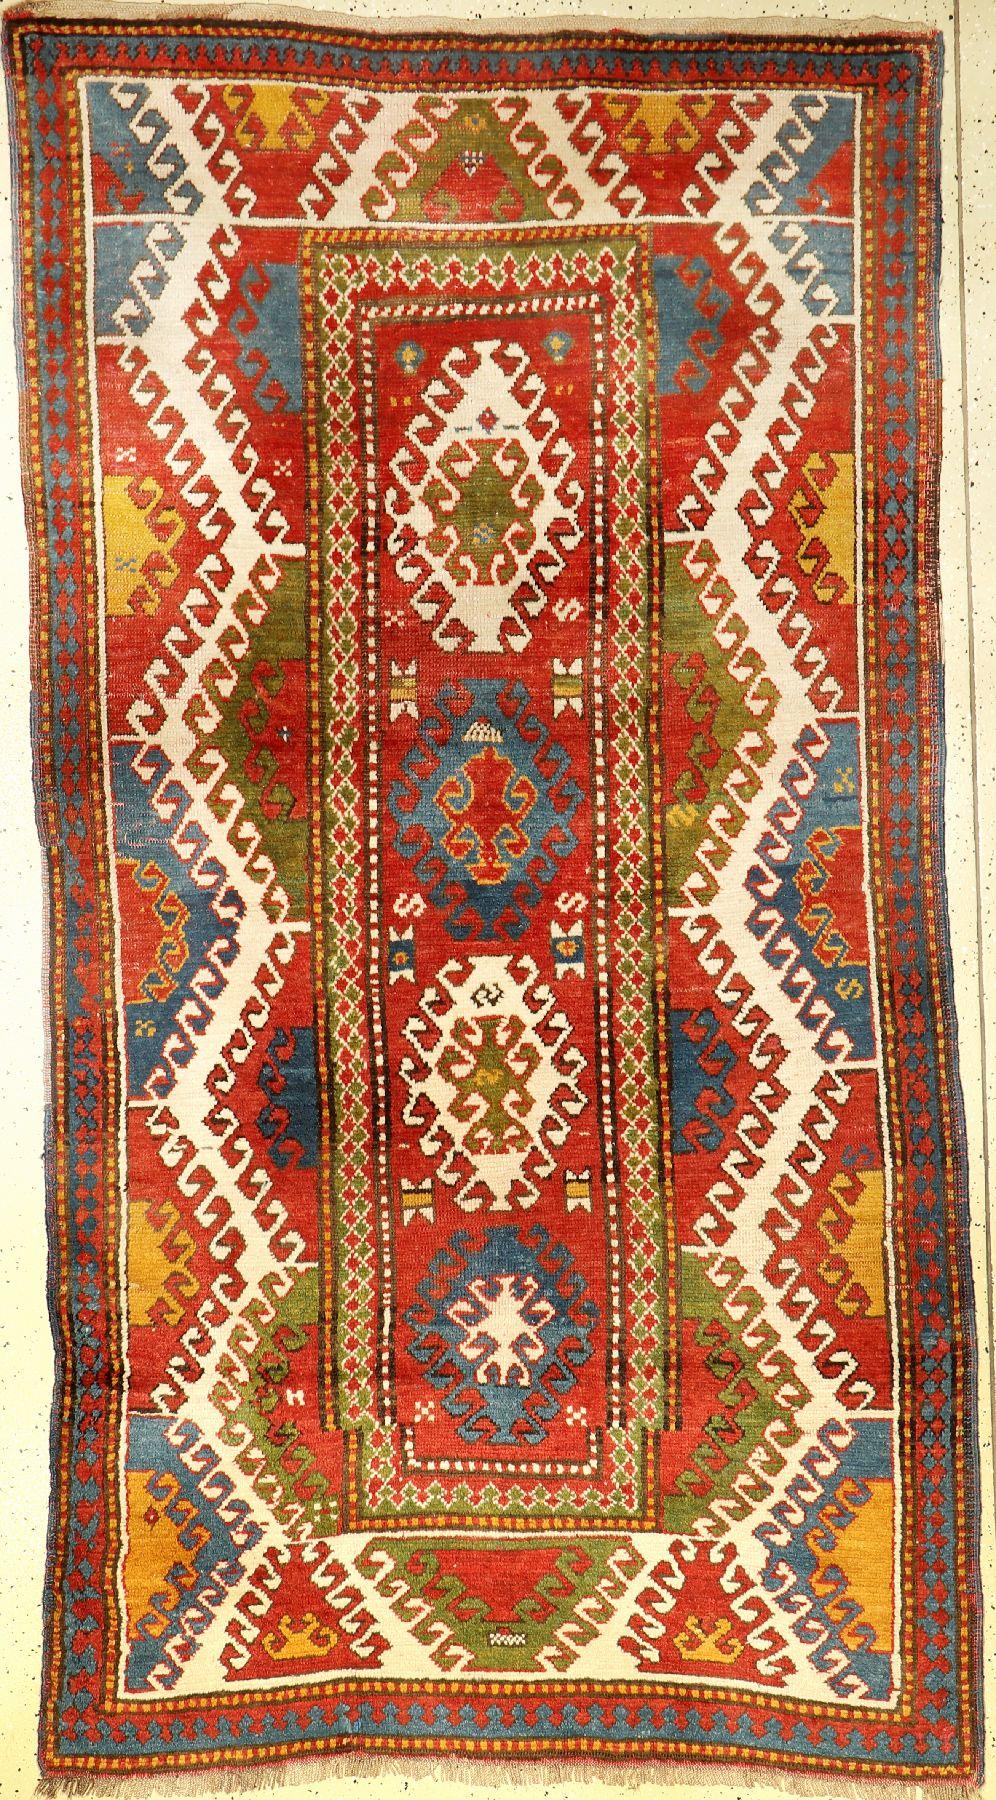 Bordjalou Kazak antique, Caucasus, around 1900, wool on wool, approx. 250 x 133 cm, collector's